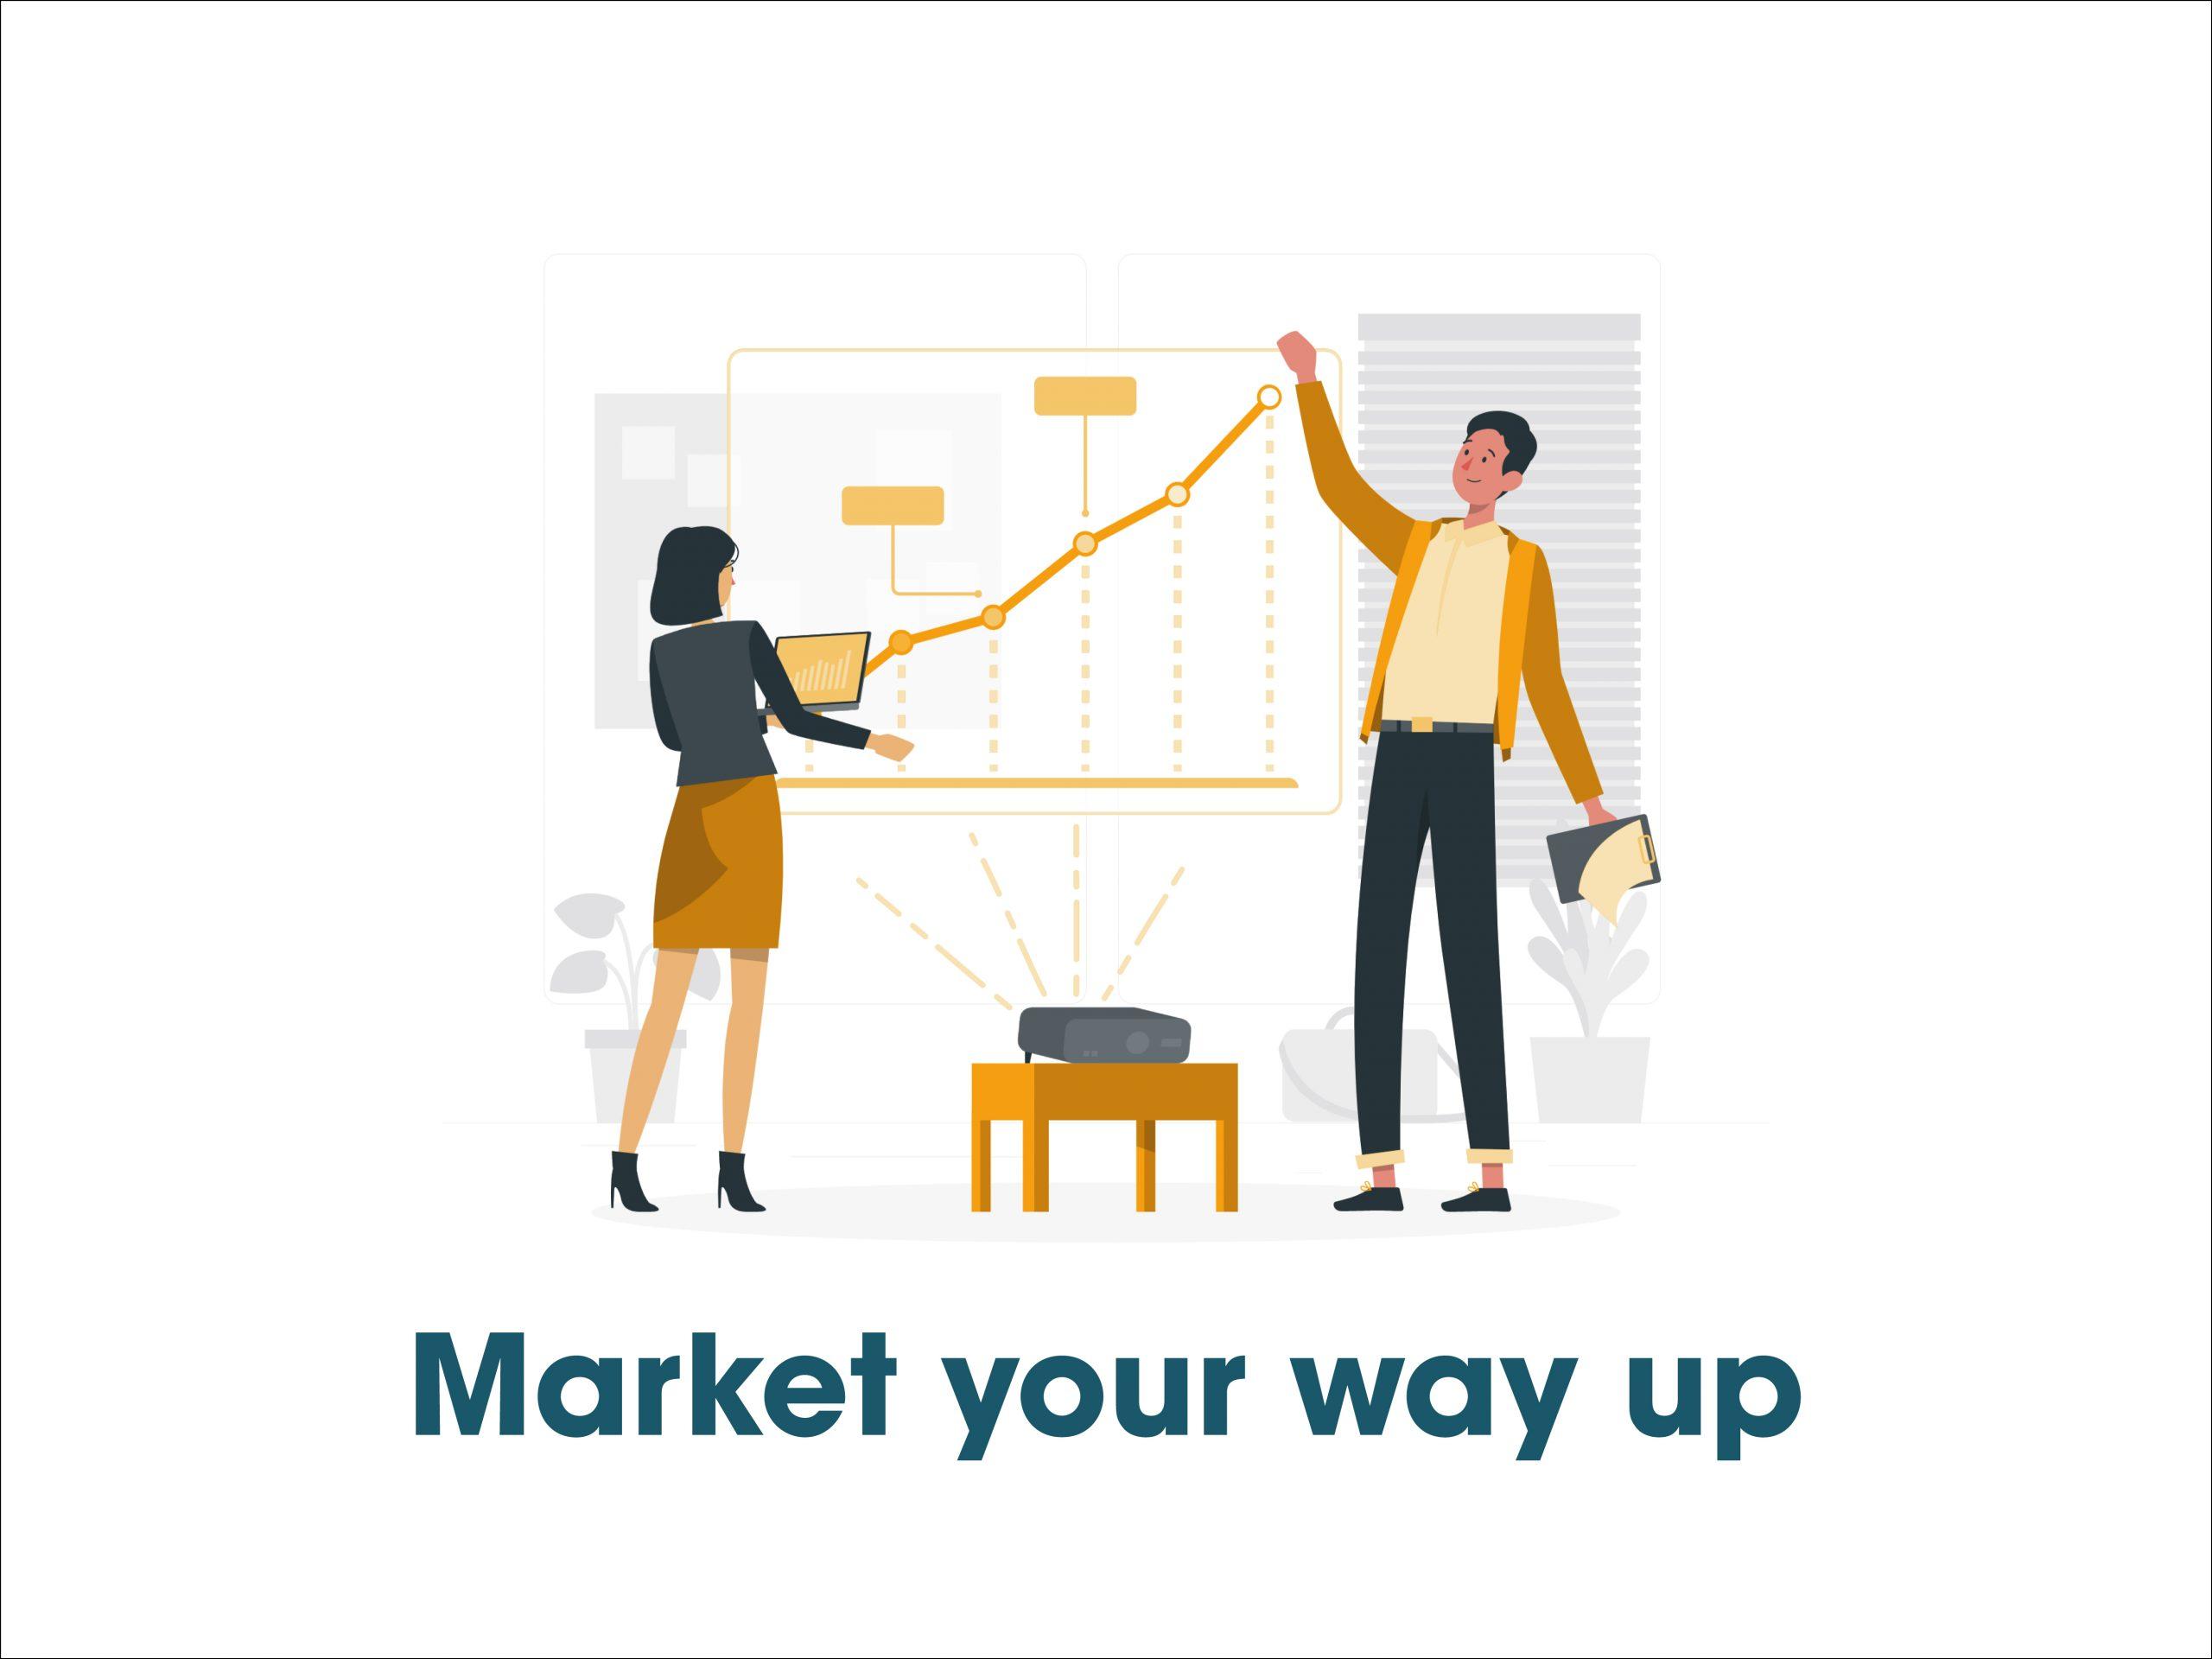 market ur way up in digital marketing